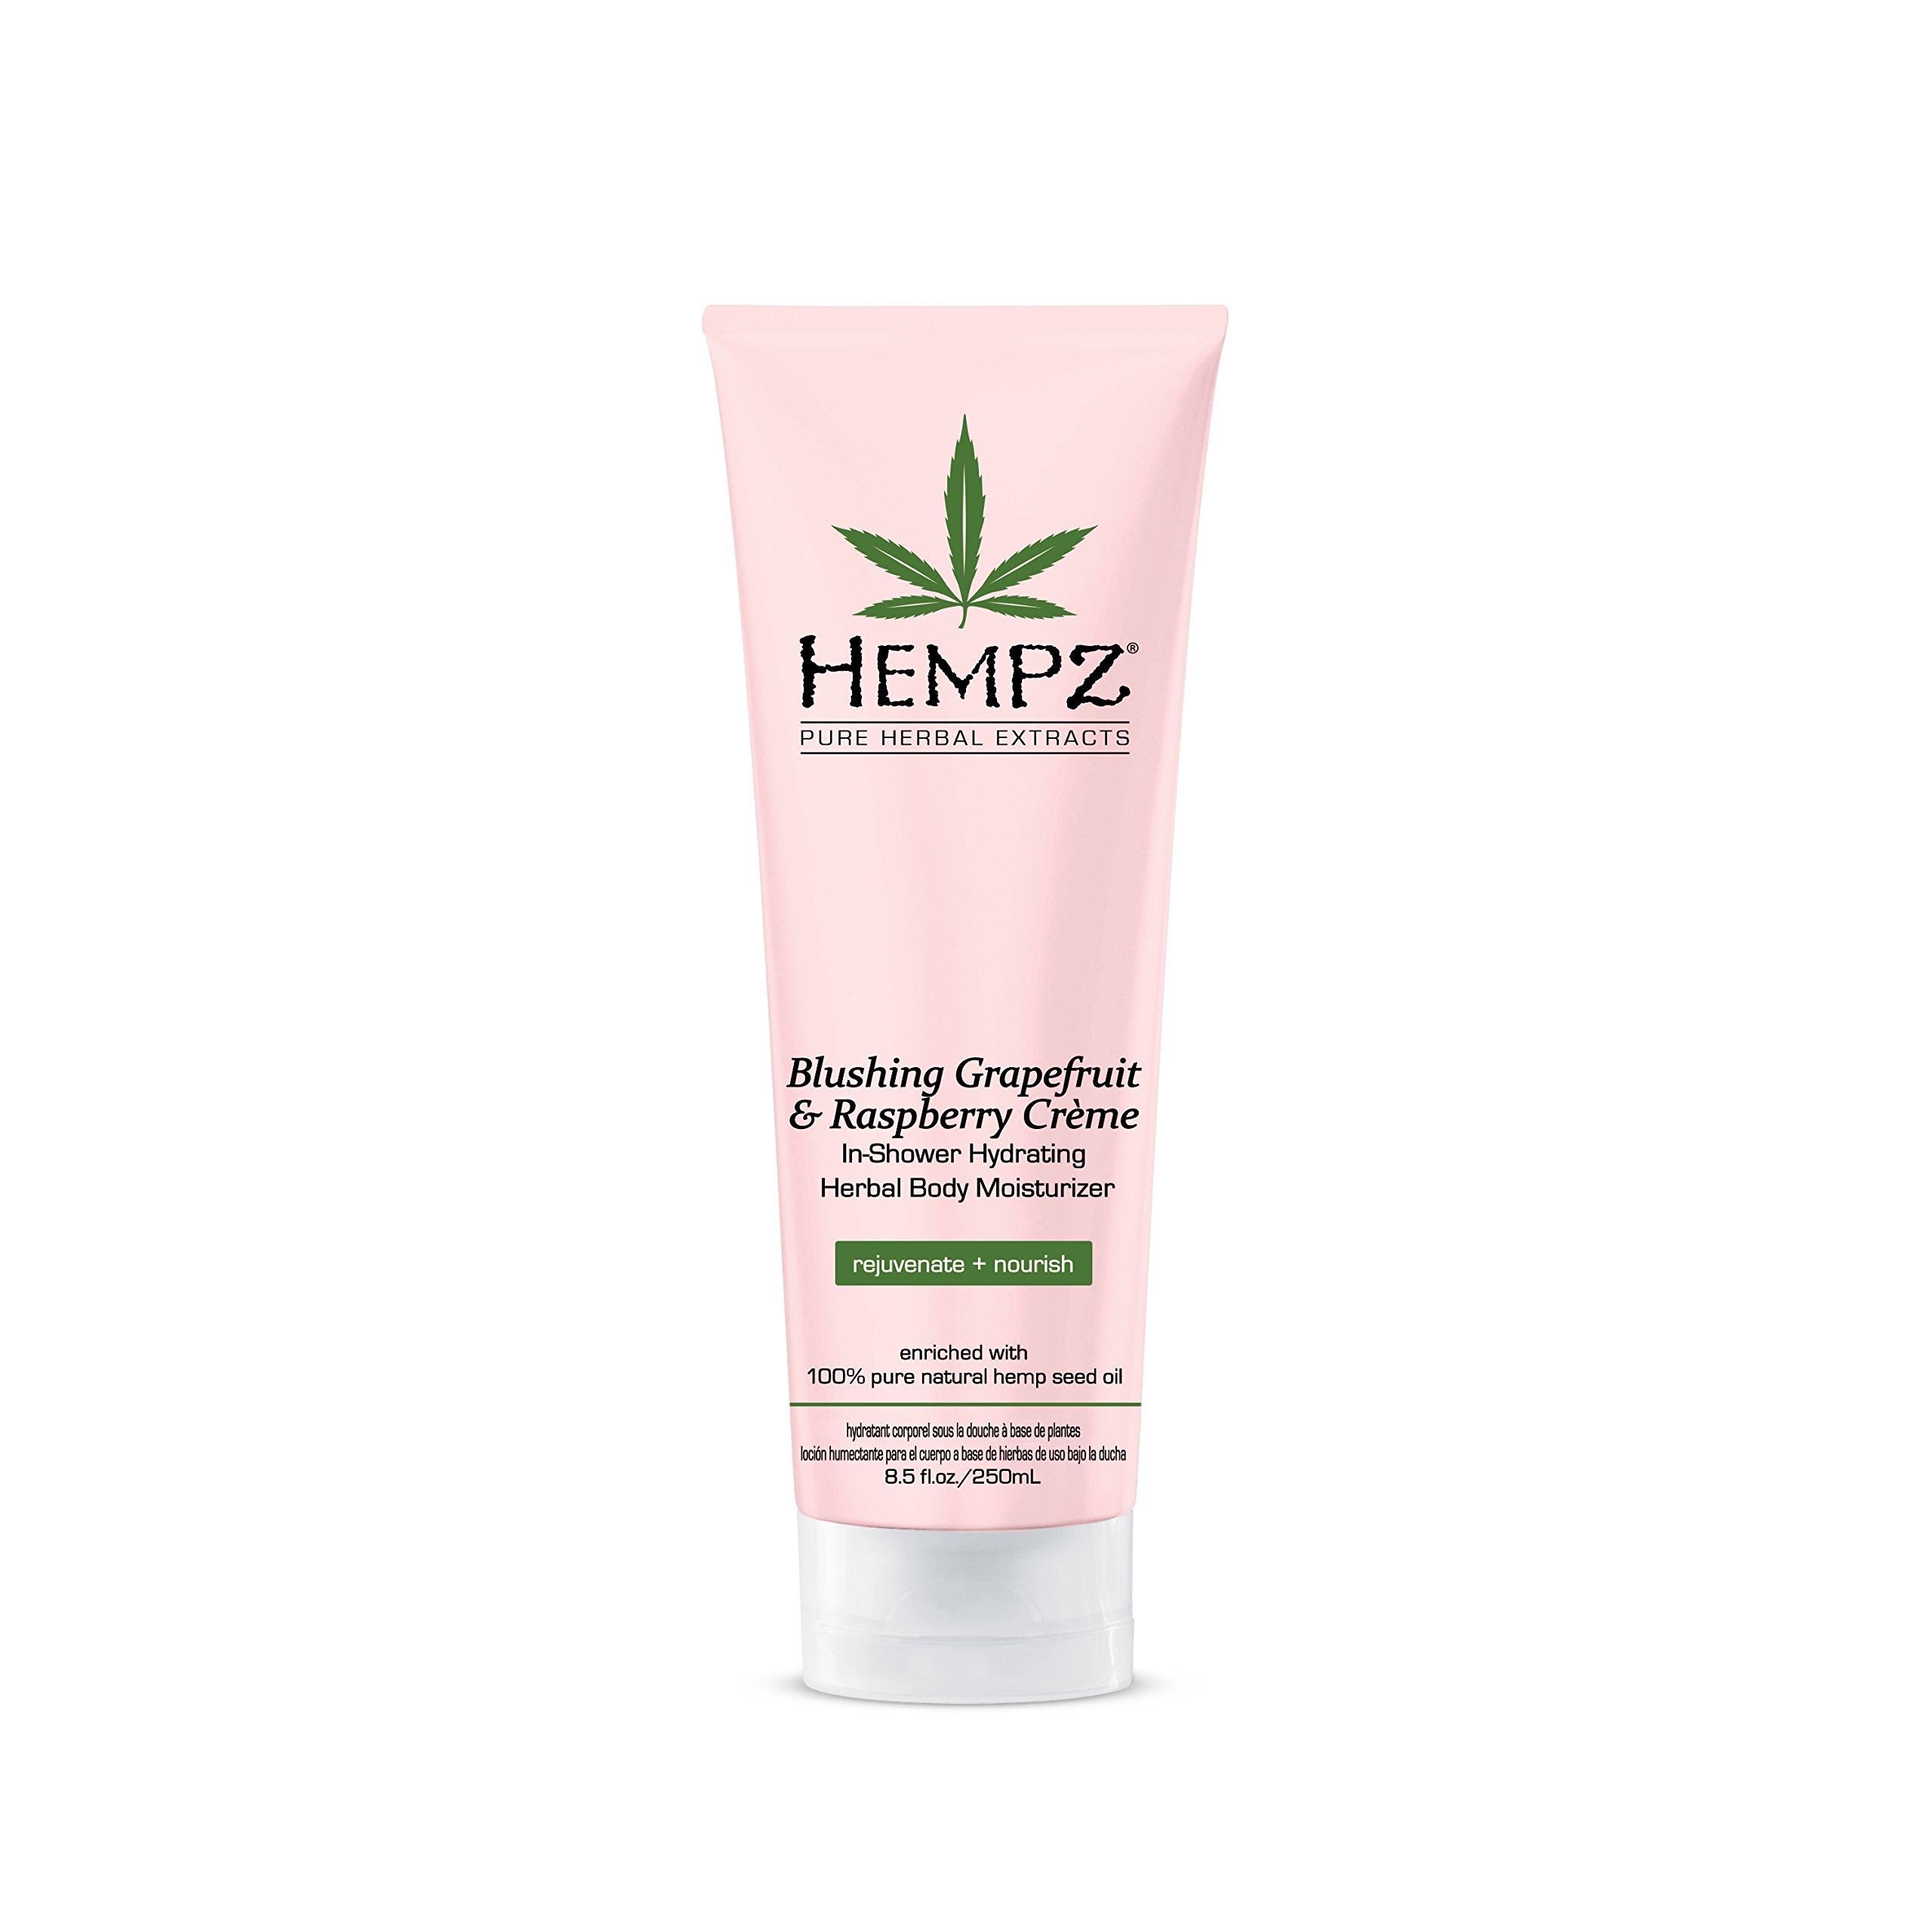 Hempz In-Shower Hydrating Herbal Body Moisturizer Light Pink Blushing Grapefr.. 4